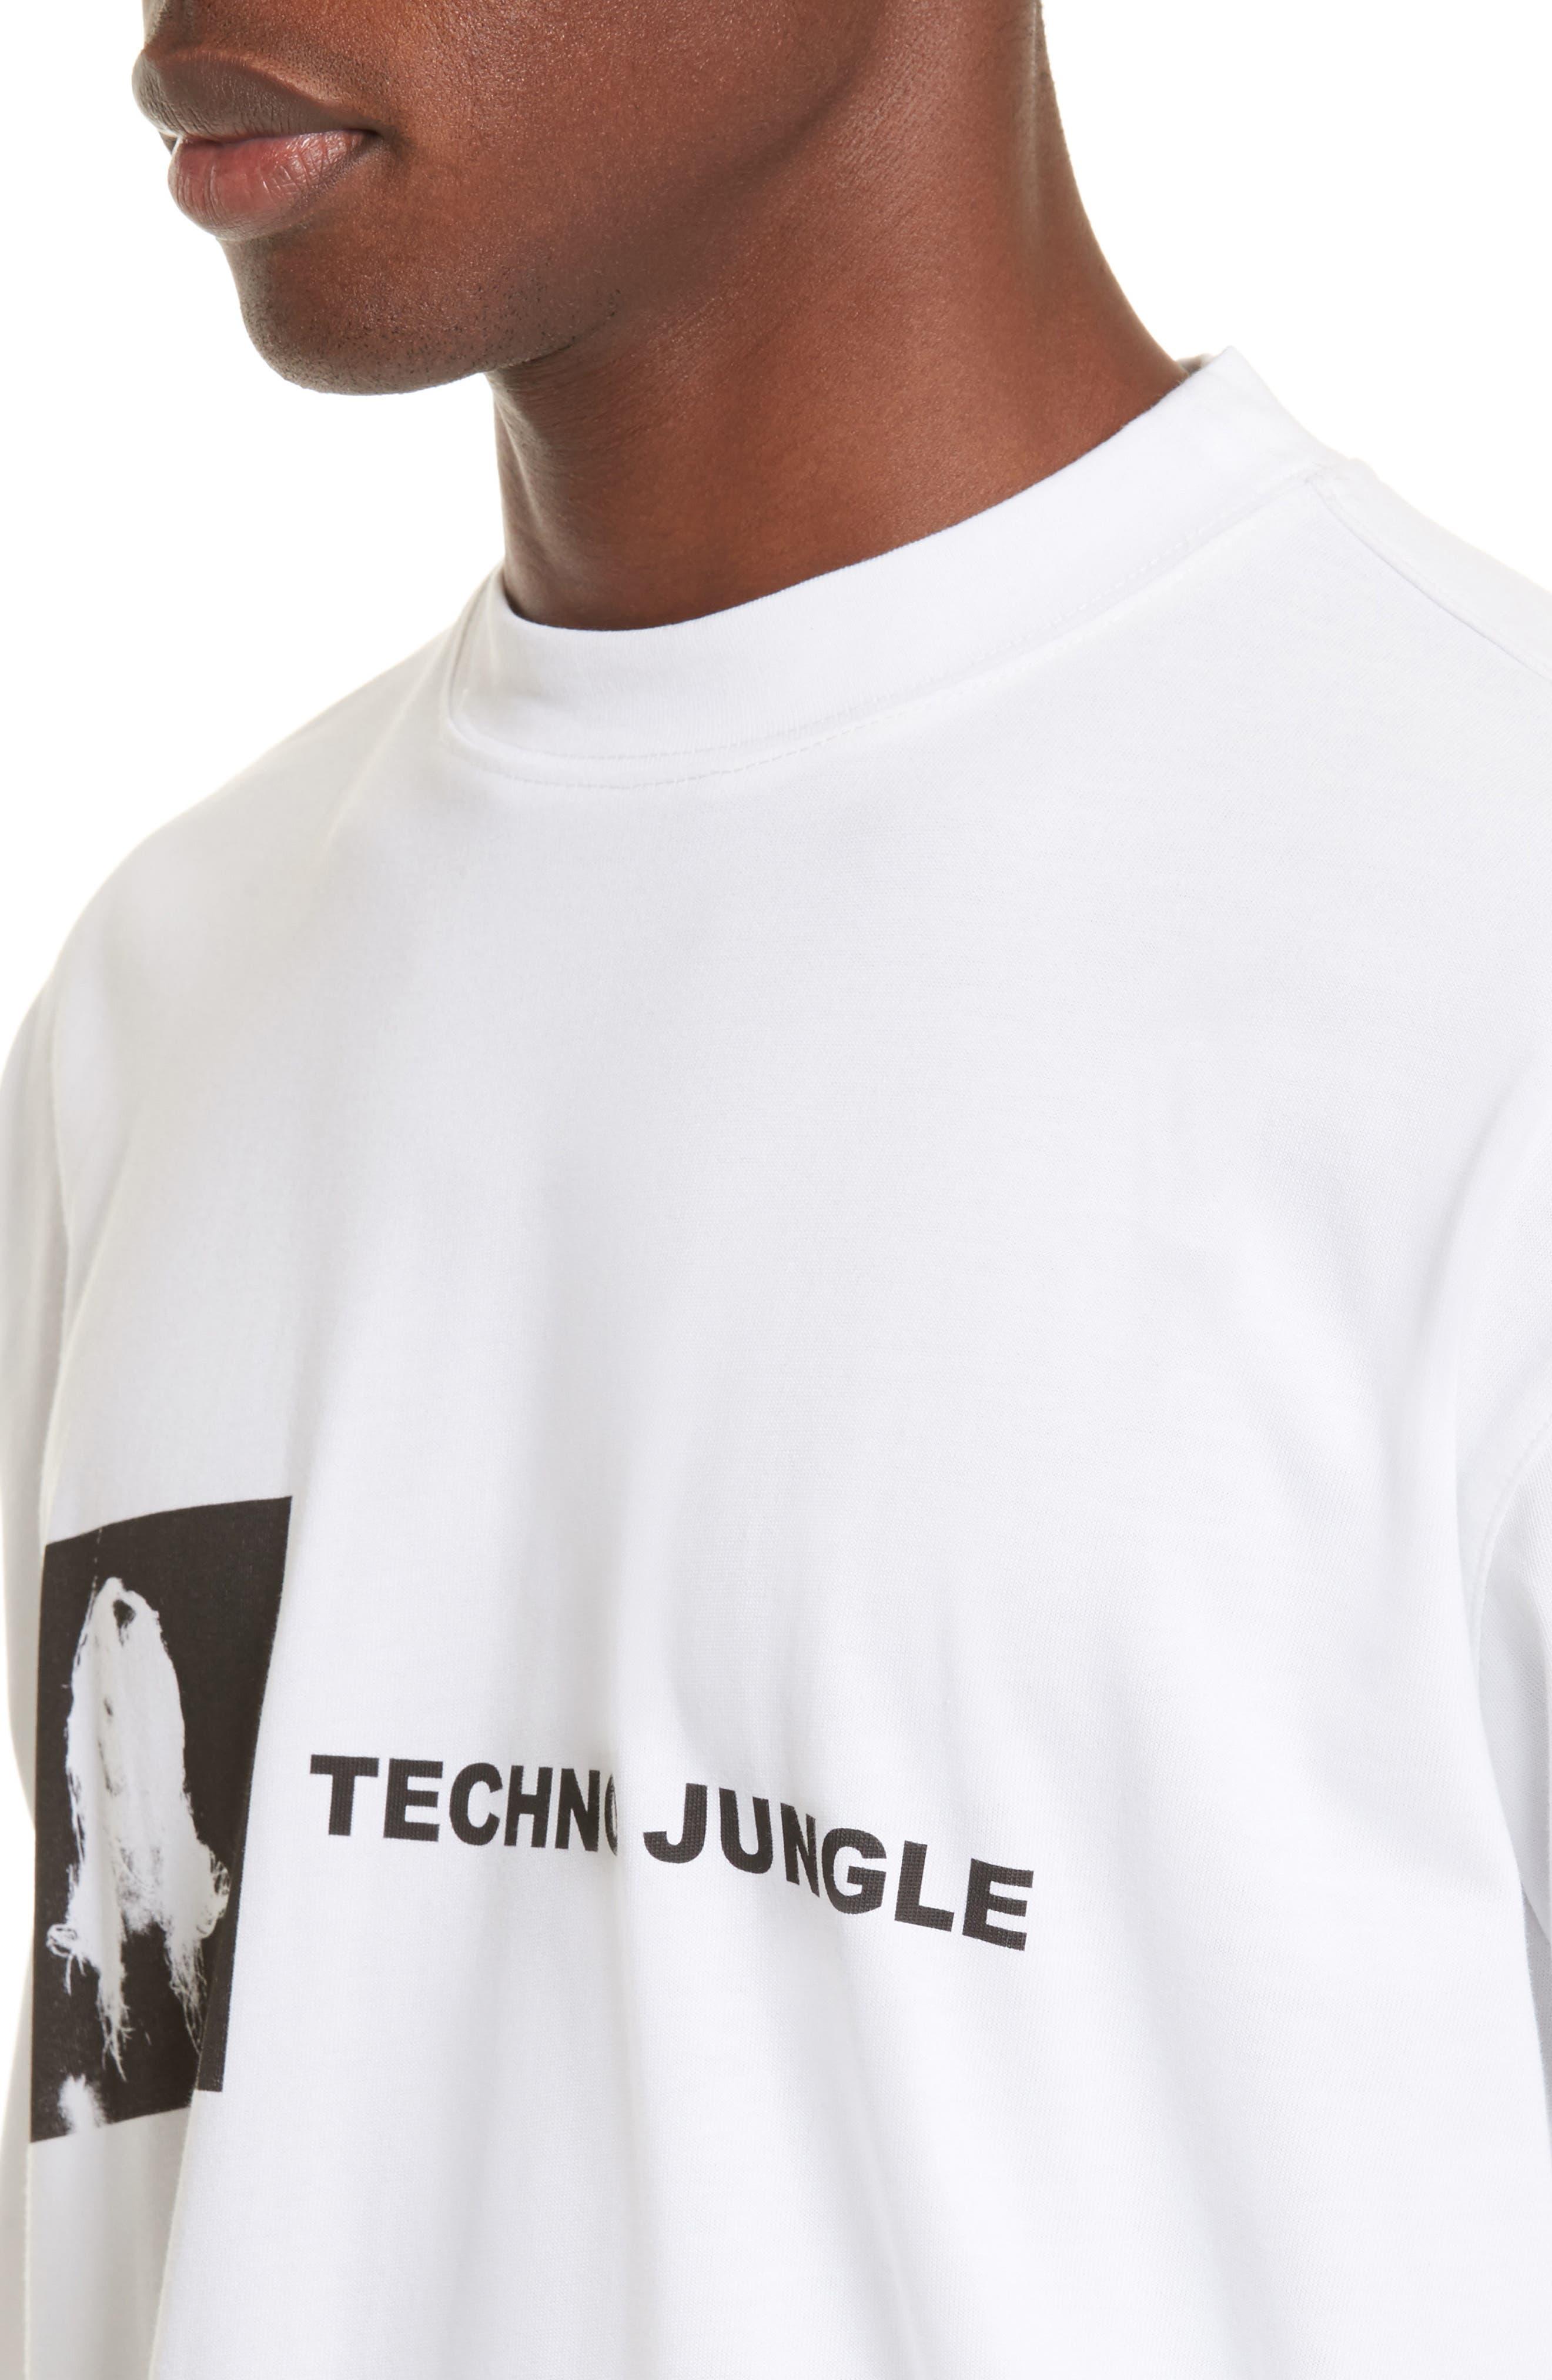 Techno Jungle Graphic T-Shirt,                             Alternate thumbnail 4, color,                             White